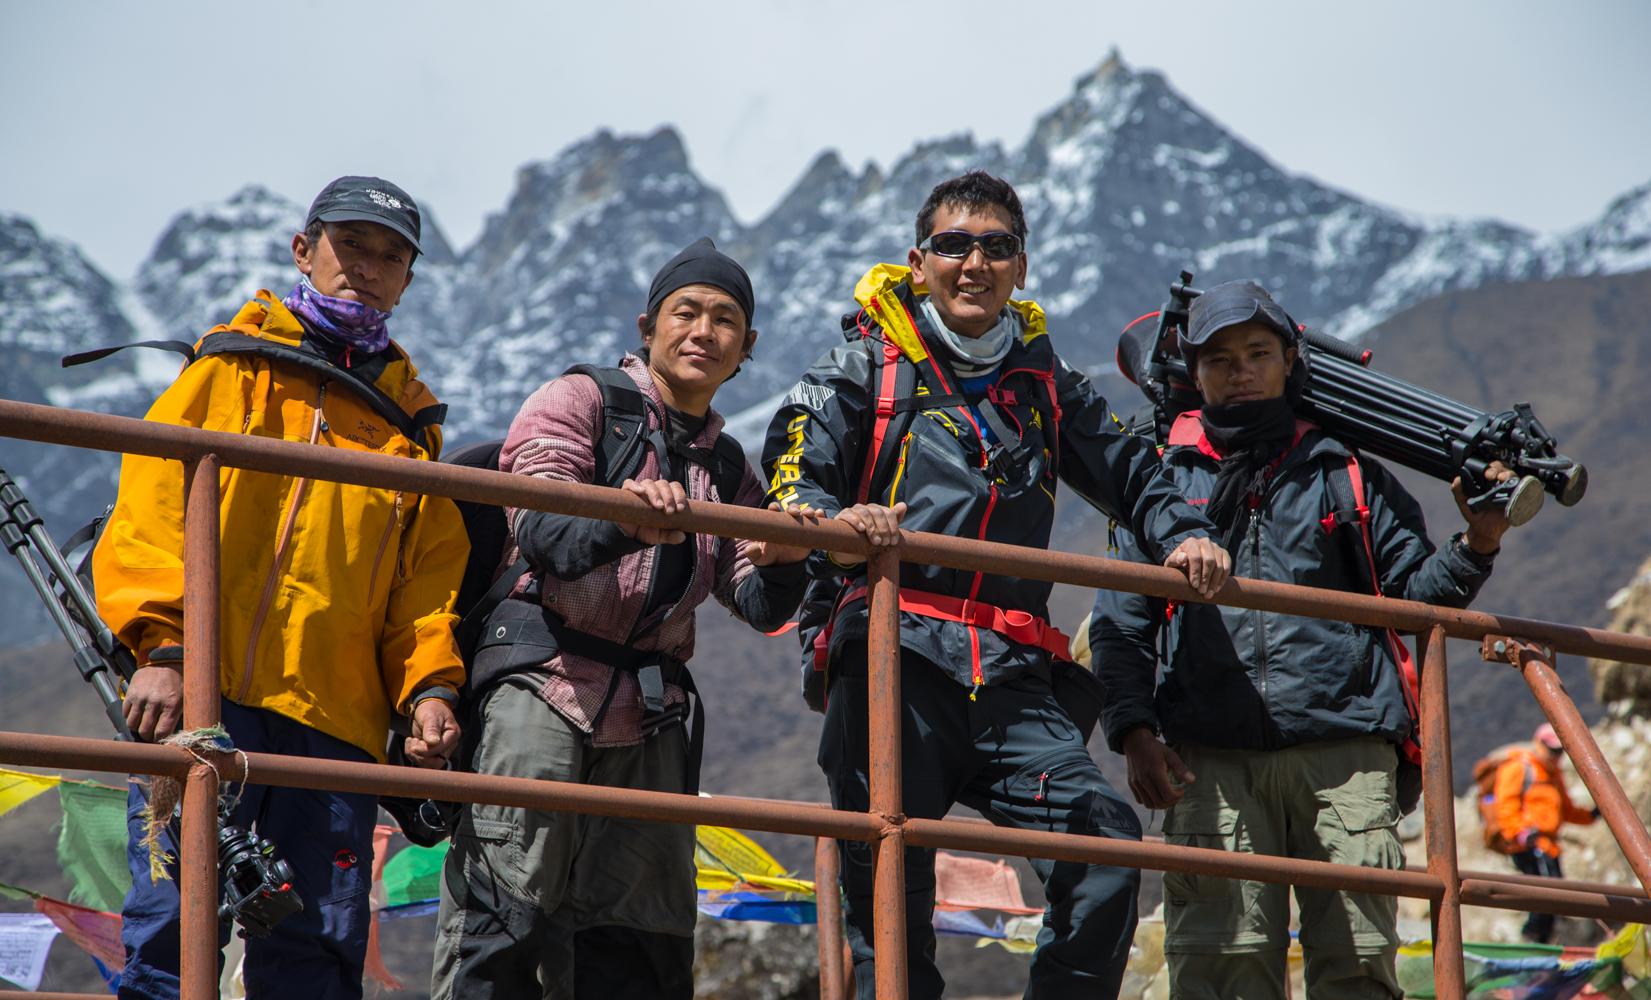 The Sherpa film crew lead by Pasang Kaji